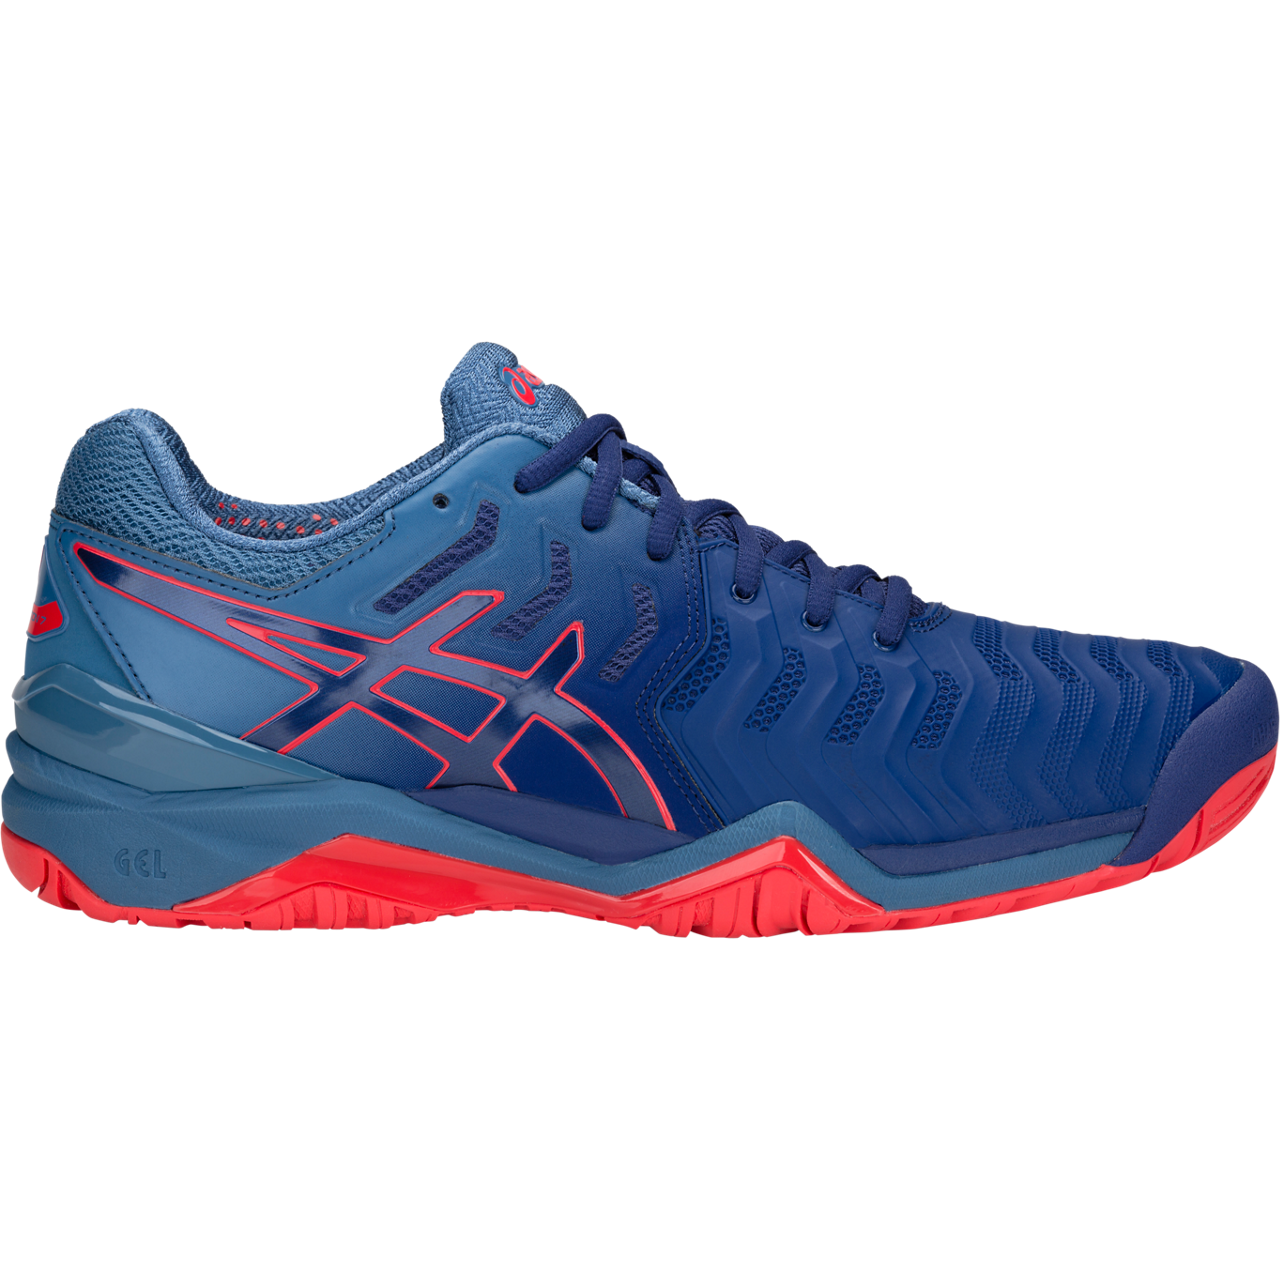 asics gel-resolution 7 tennis shoe quotes